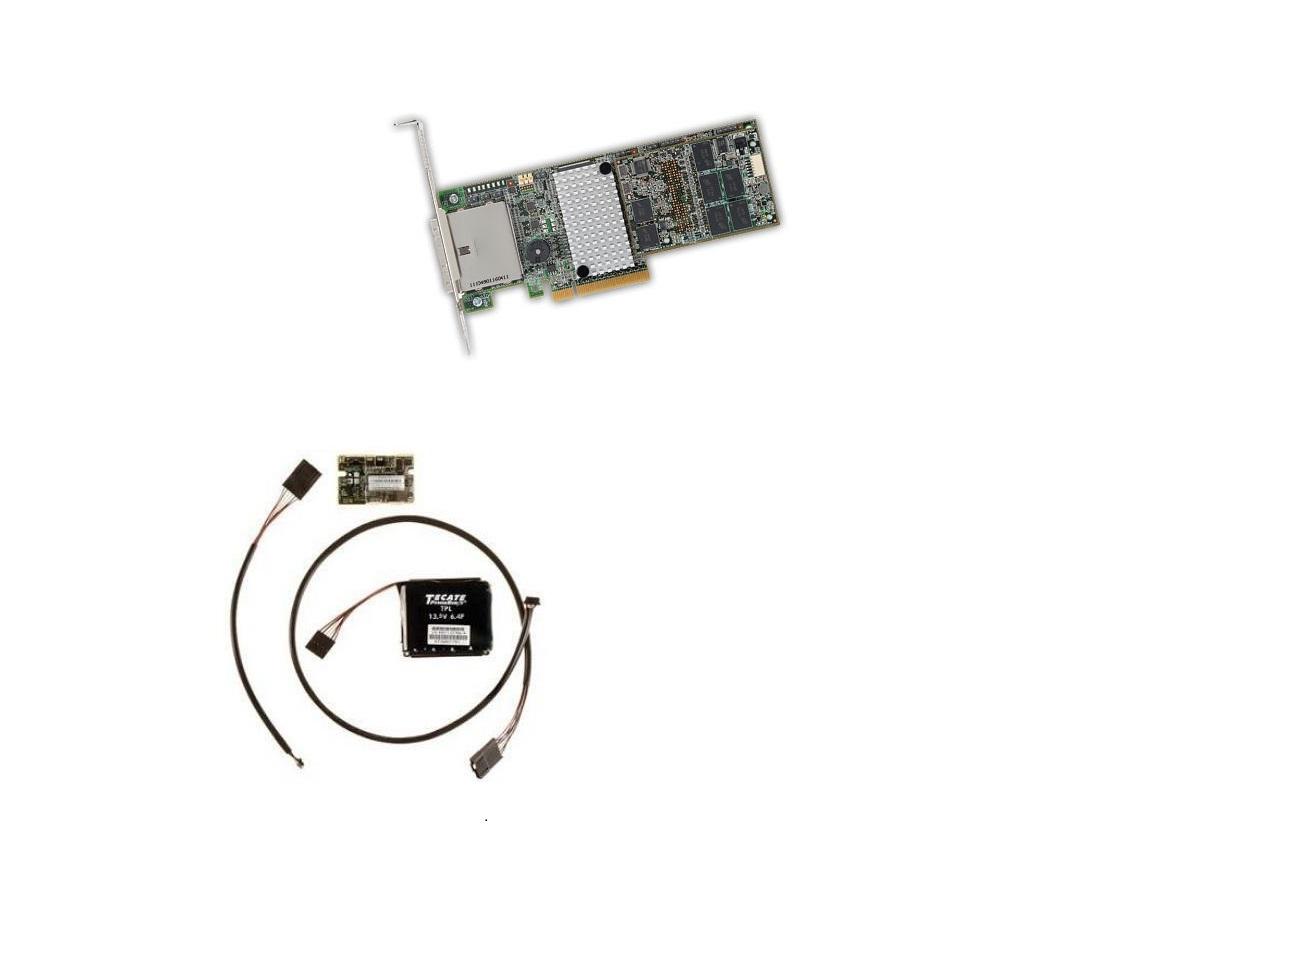 LSI Logic L5-25421-12 MegaRaid 9286CV-8e 8-Ports SAS PCI Express 3.0 RAID Controller w/Battery